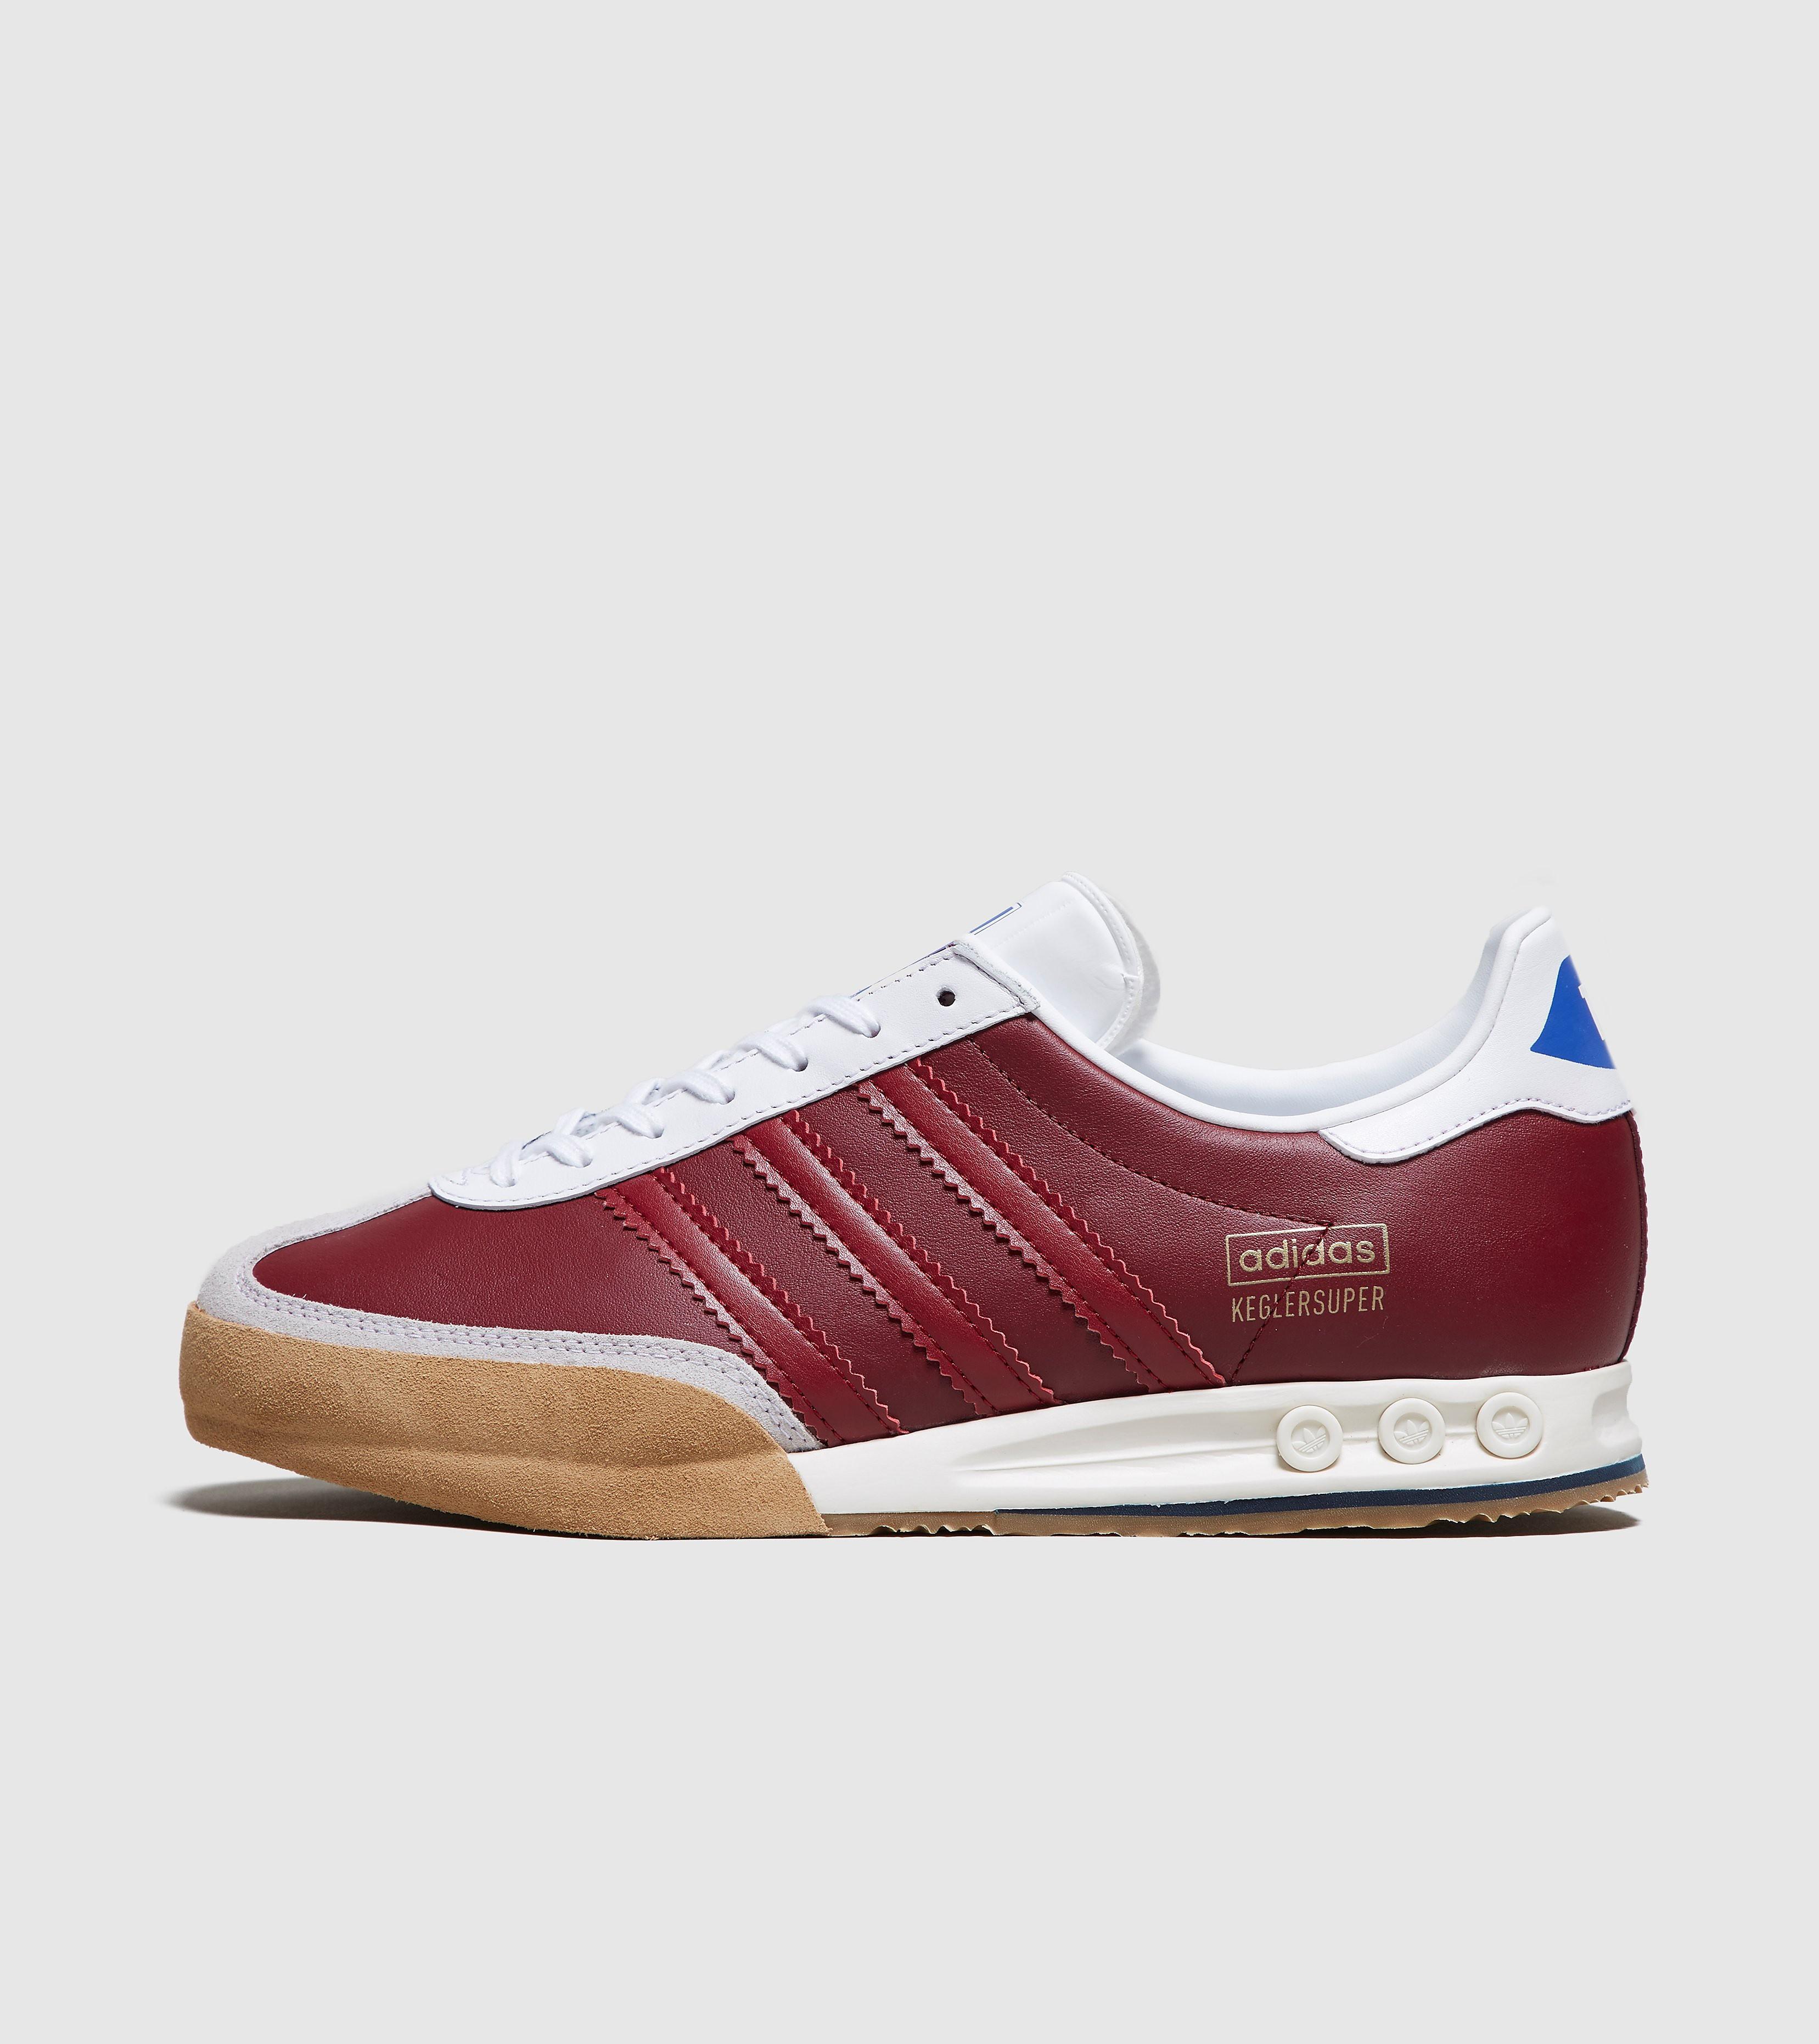 Sneaker Adidas adidas Originals Kegler Super 'Bowling' - size? Exclusive